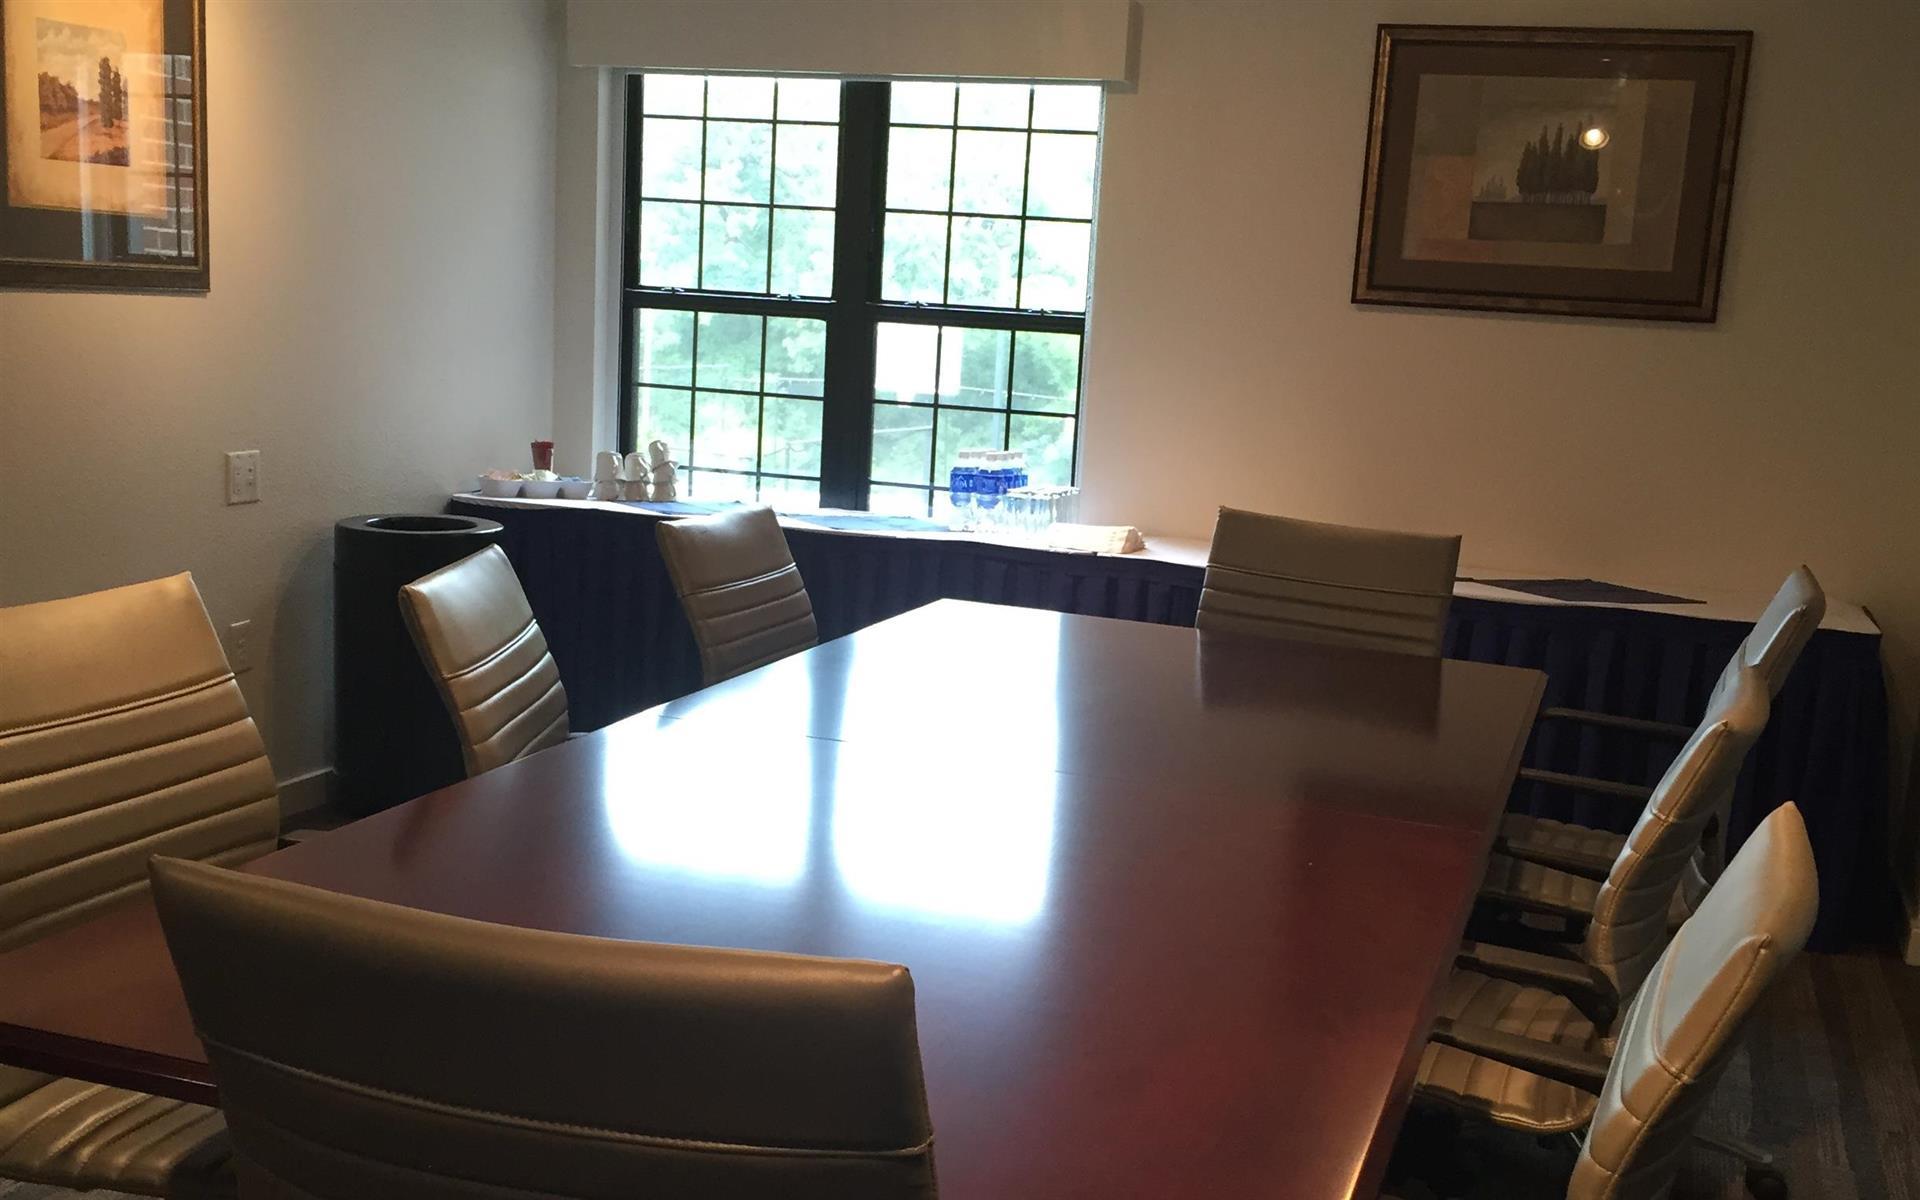 Hyatt House Parsippany East - New Jersey - Gatehall room